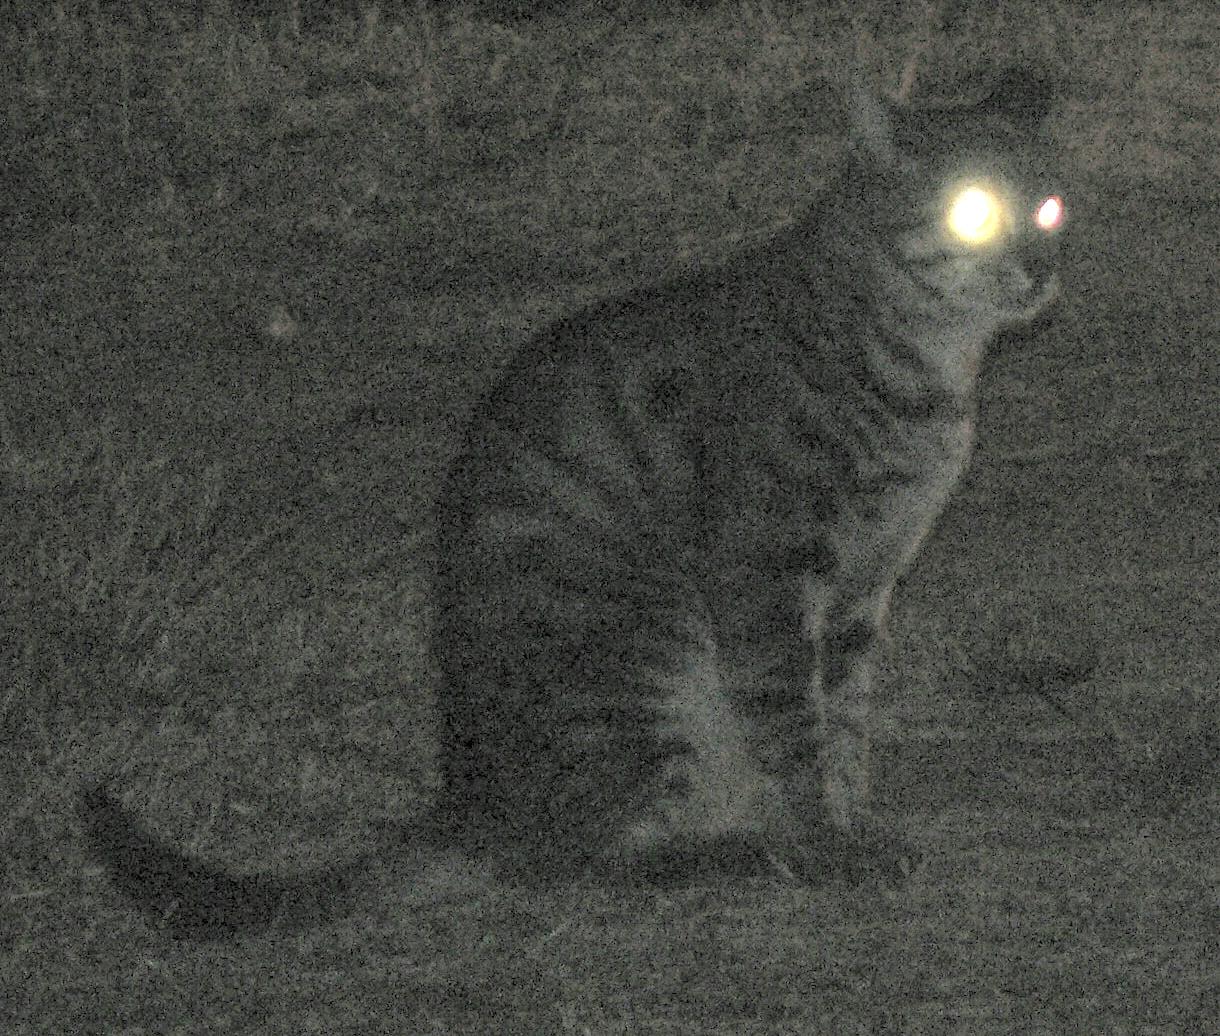 Kattenretinatapijtweerkaatsing.jpg